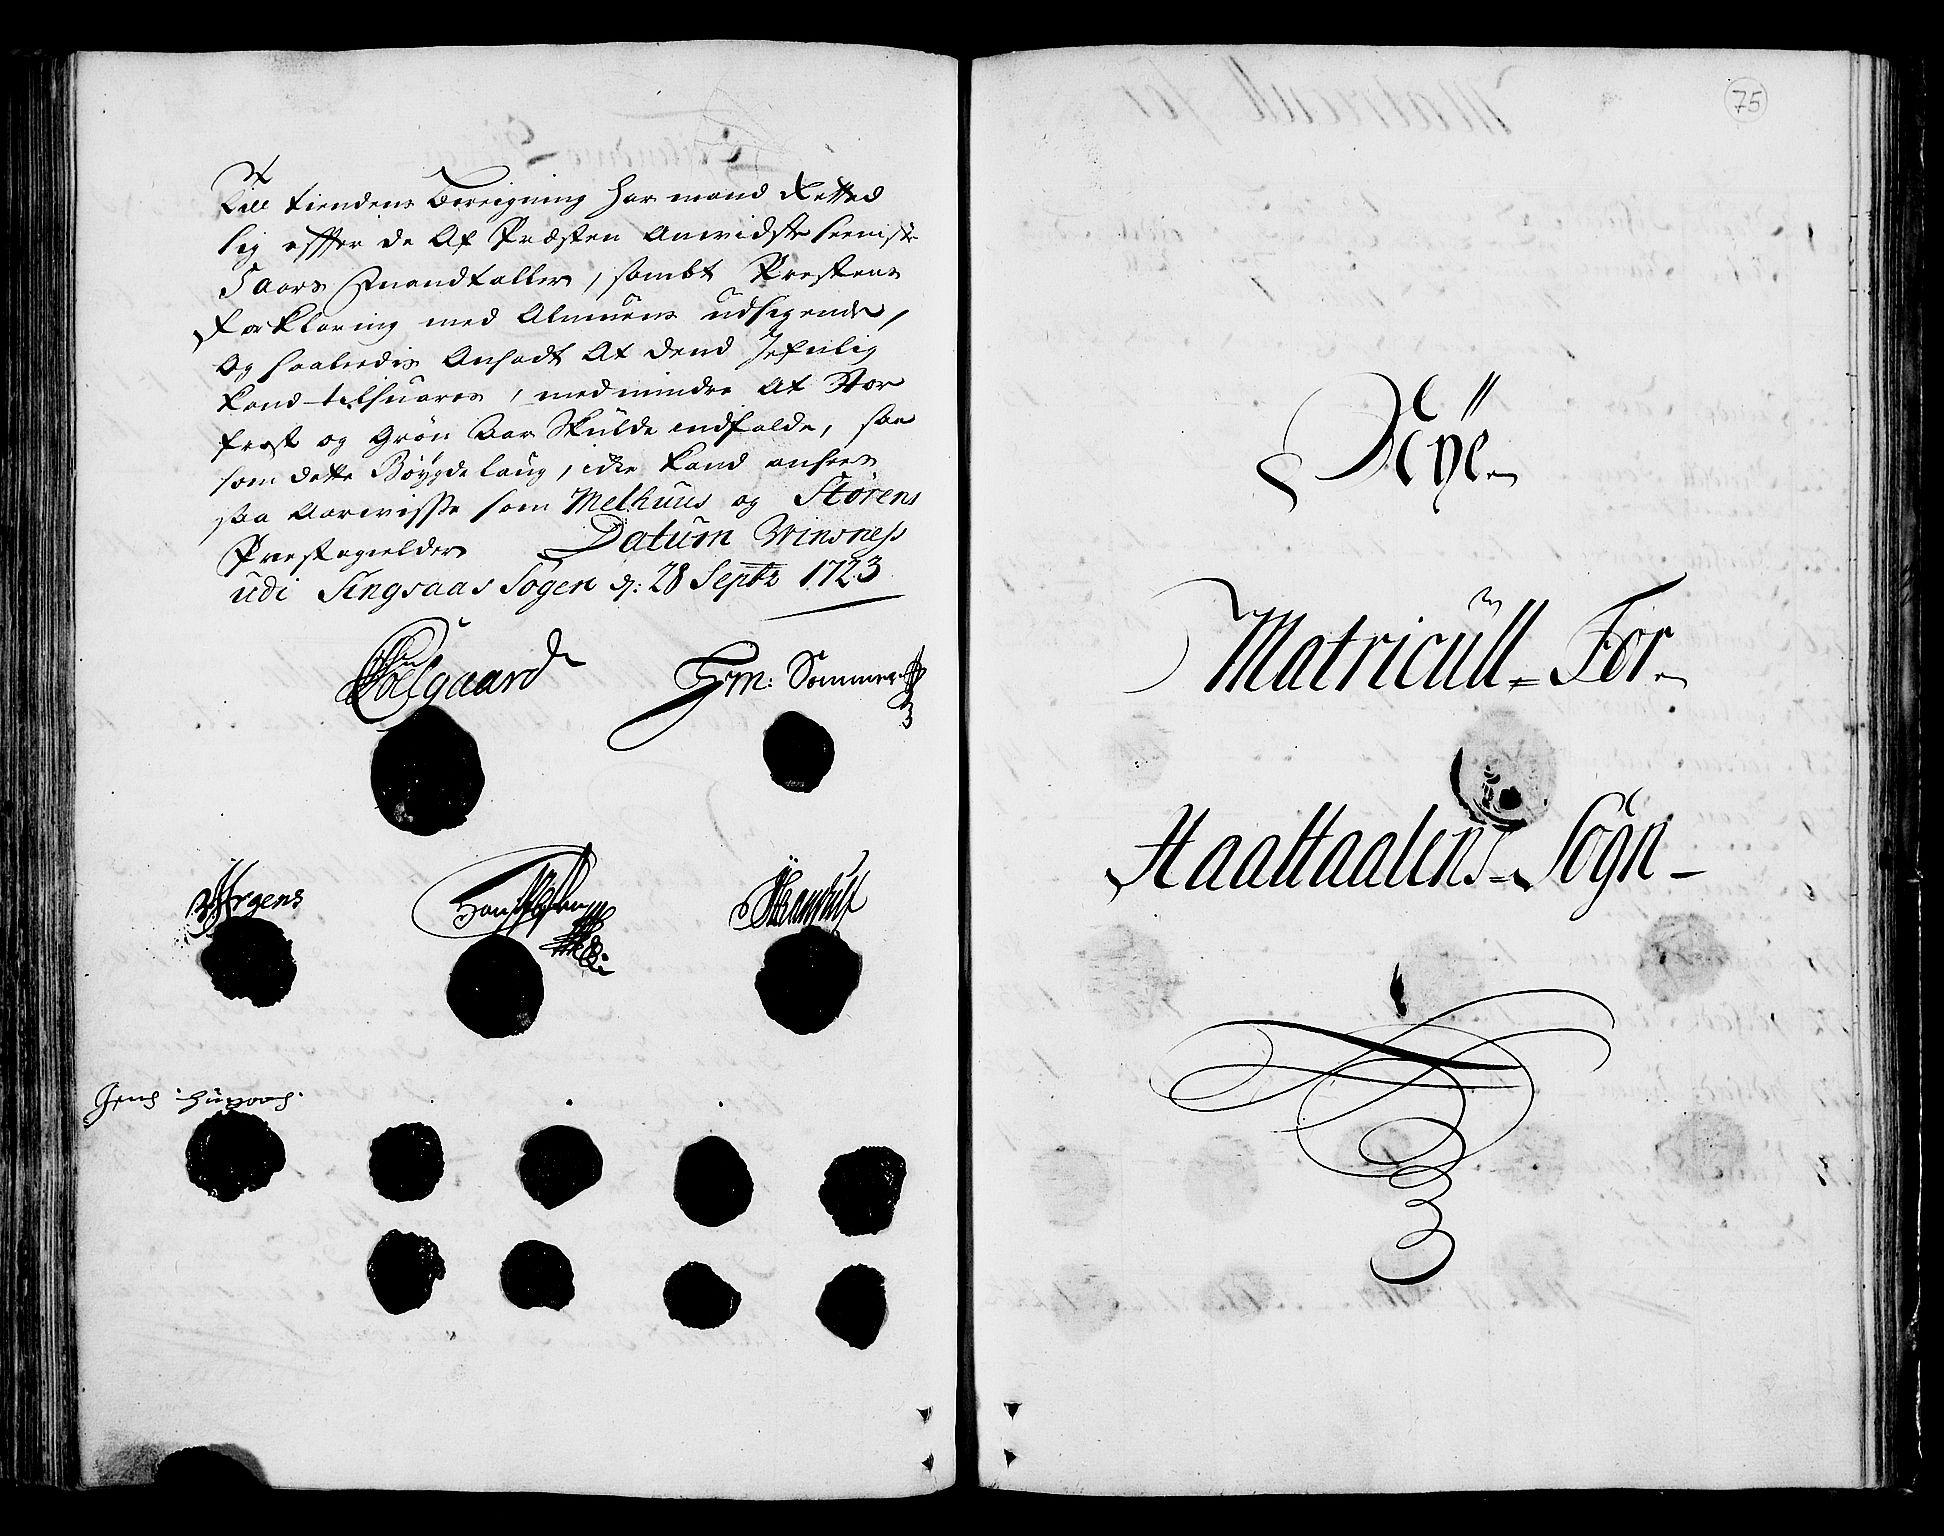 RA, Rentekammeret inntil 1814, Realistisk ordnet avdeling, N/Nb/Nbf/L0159: Gauldal matrikkelprotokoll, 1723, s. 74b-75a